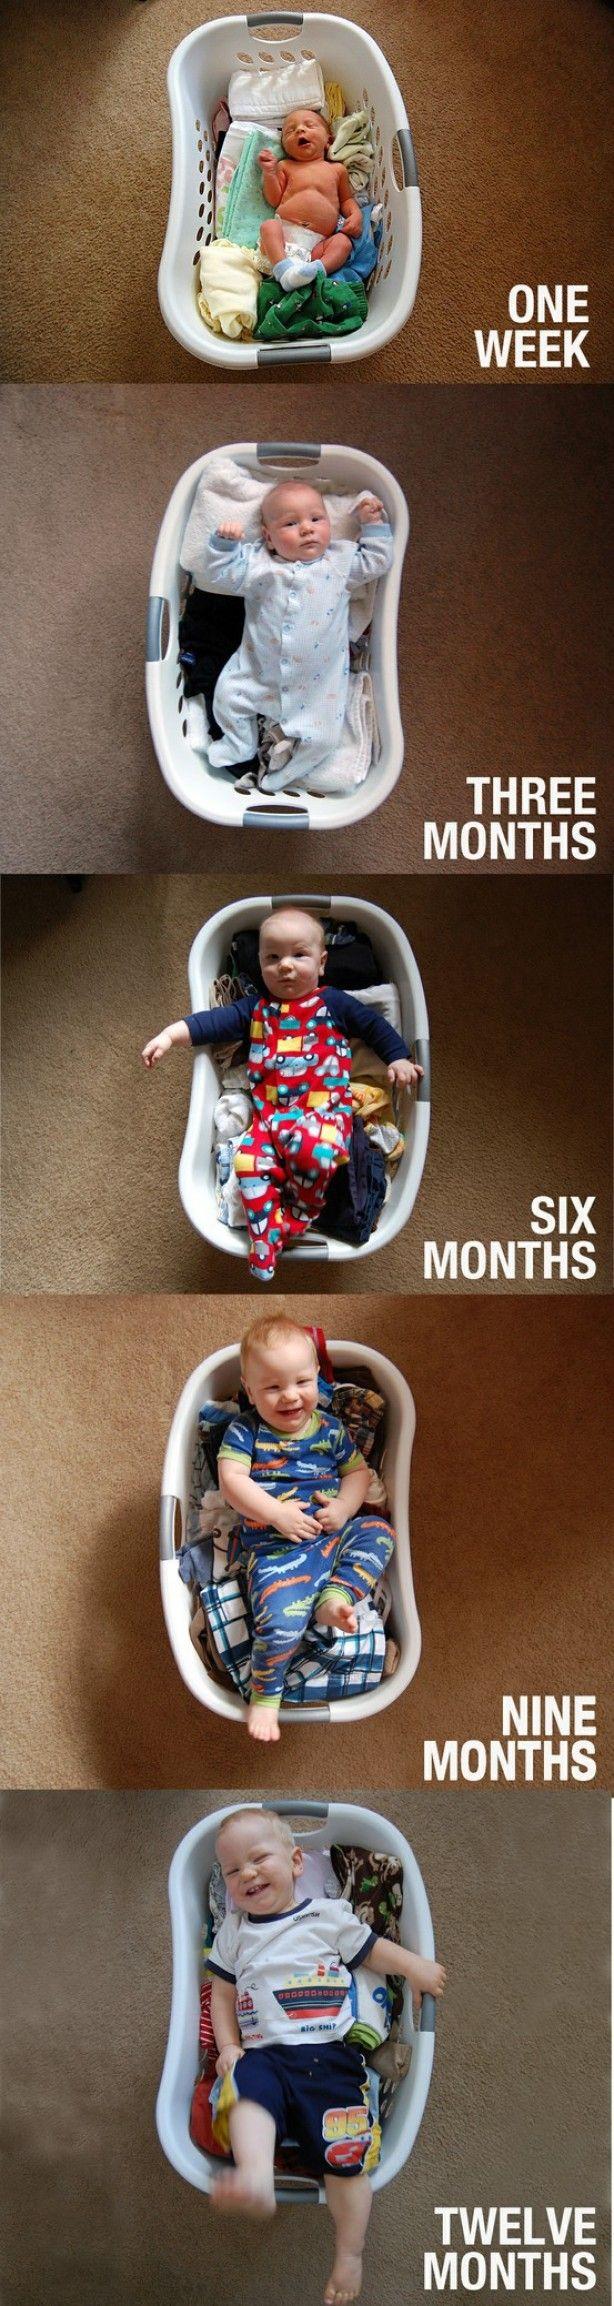 Leuke manier om de groei van je kindje vast te leggen!